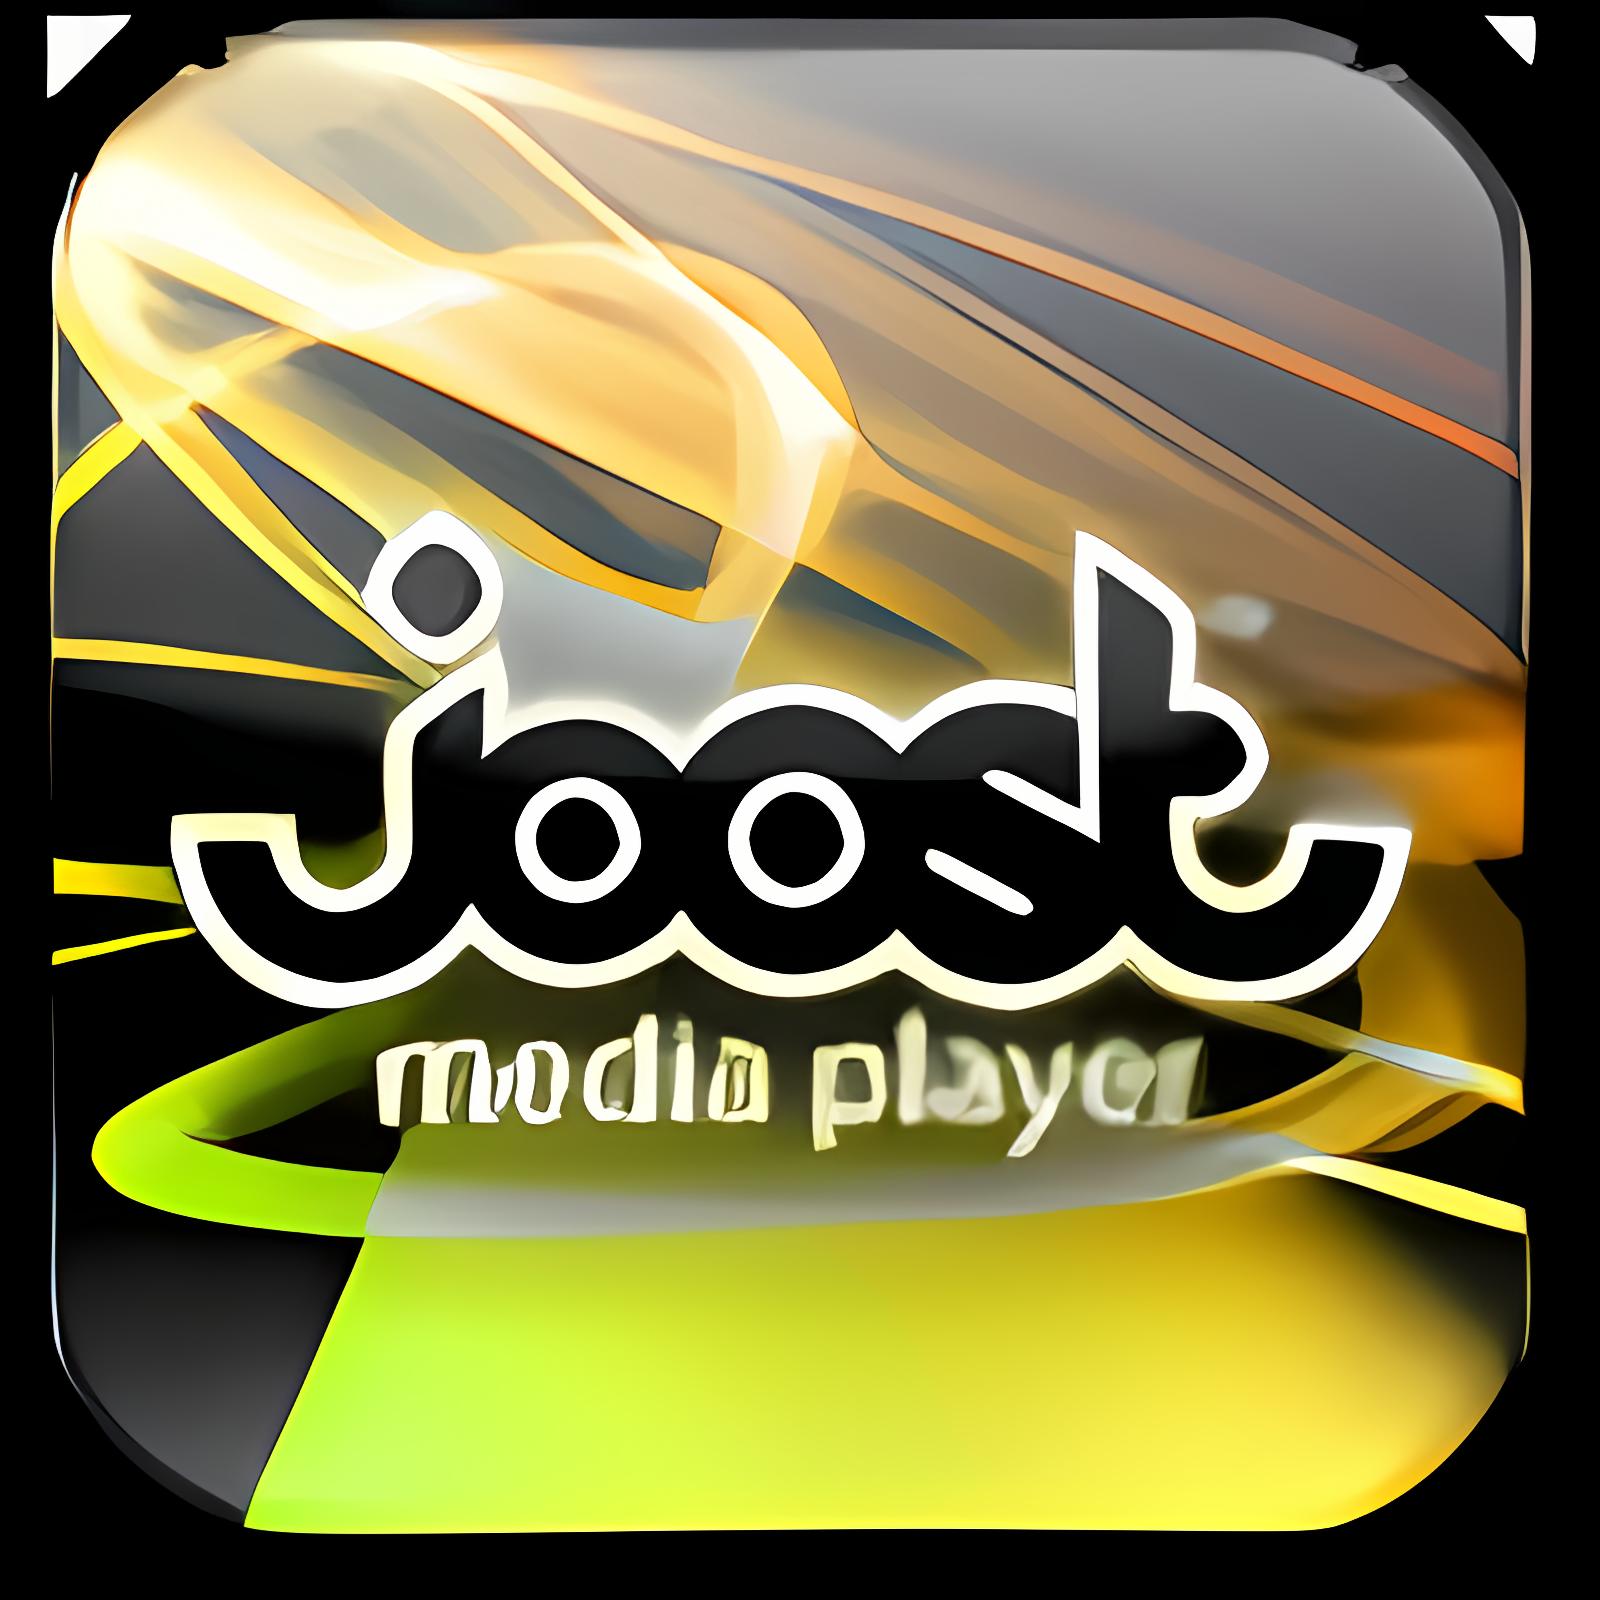 Joost Media Player